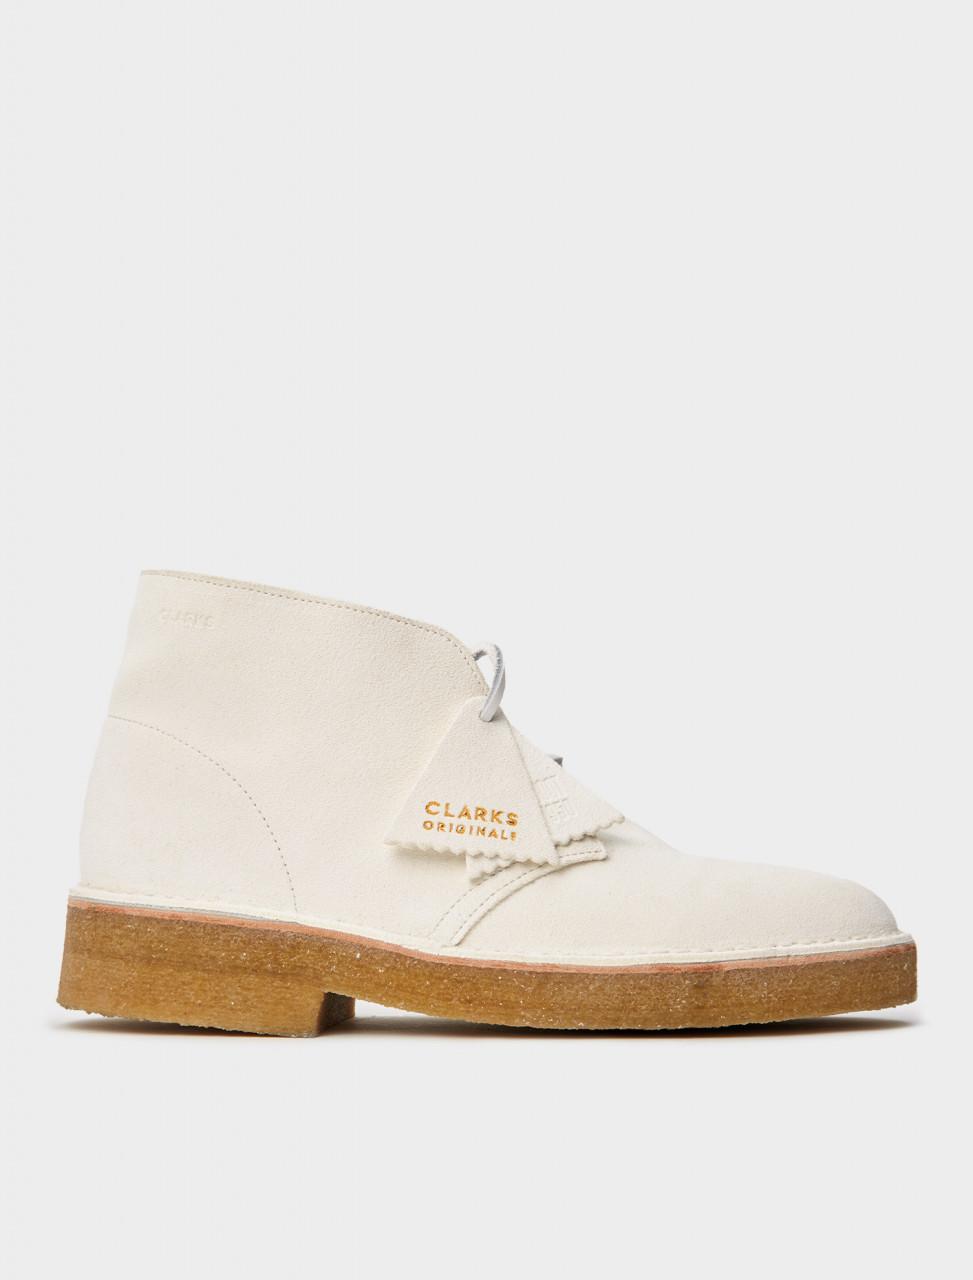 334-26155608 CLARKS Desert Boot 221 White Suede